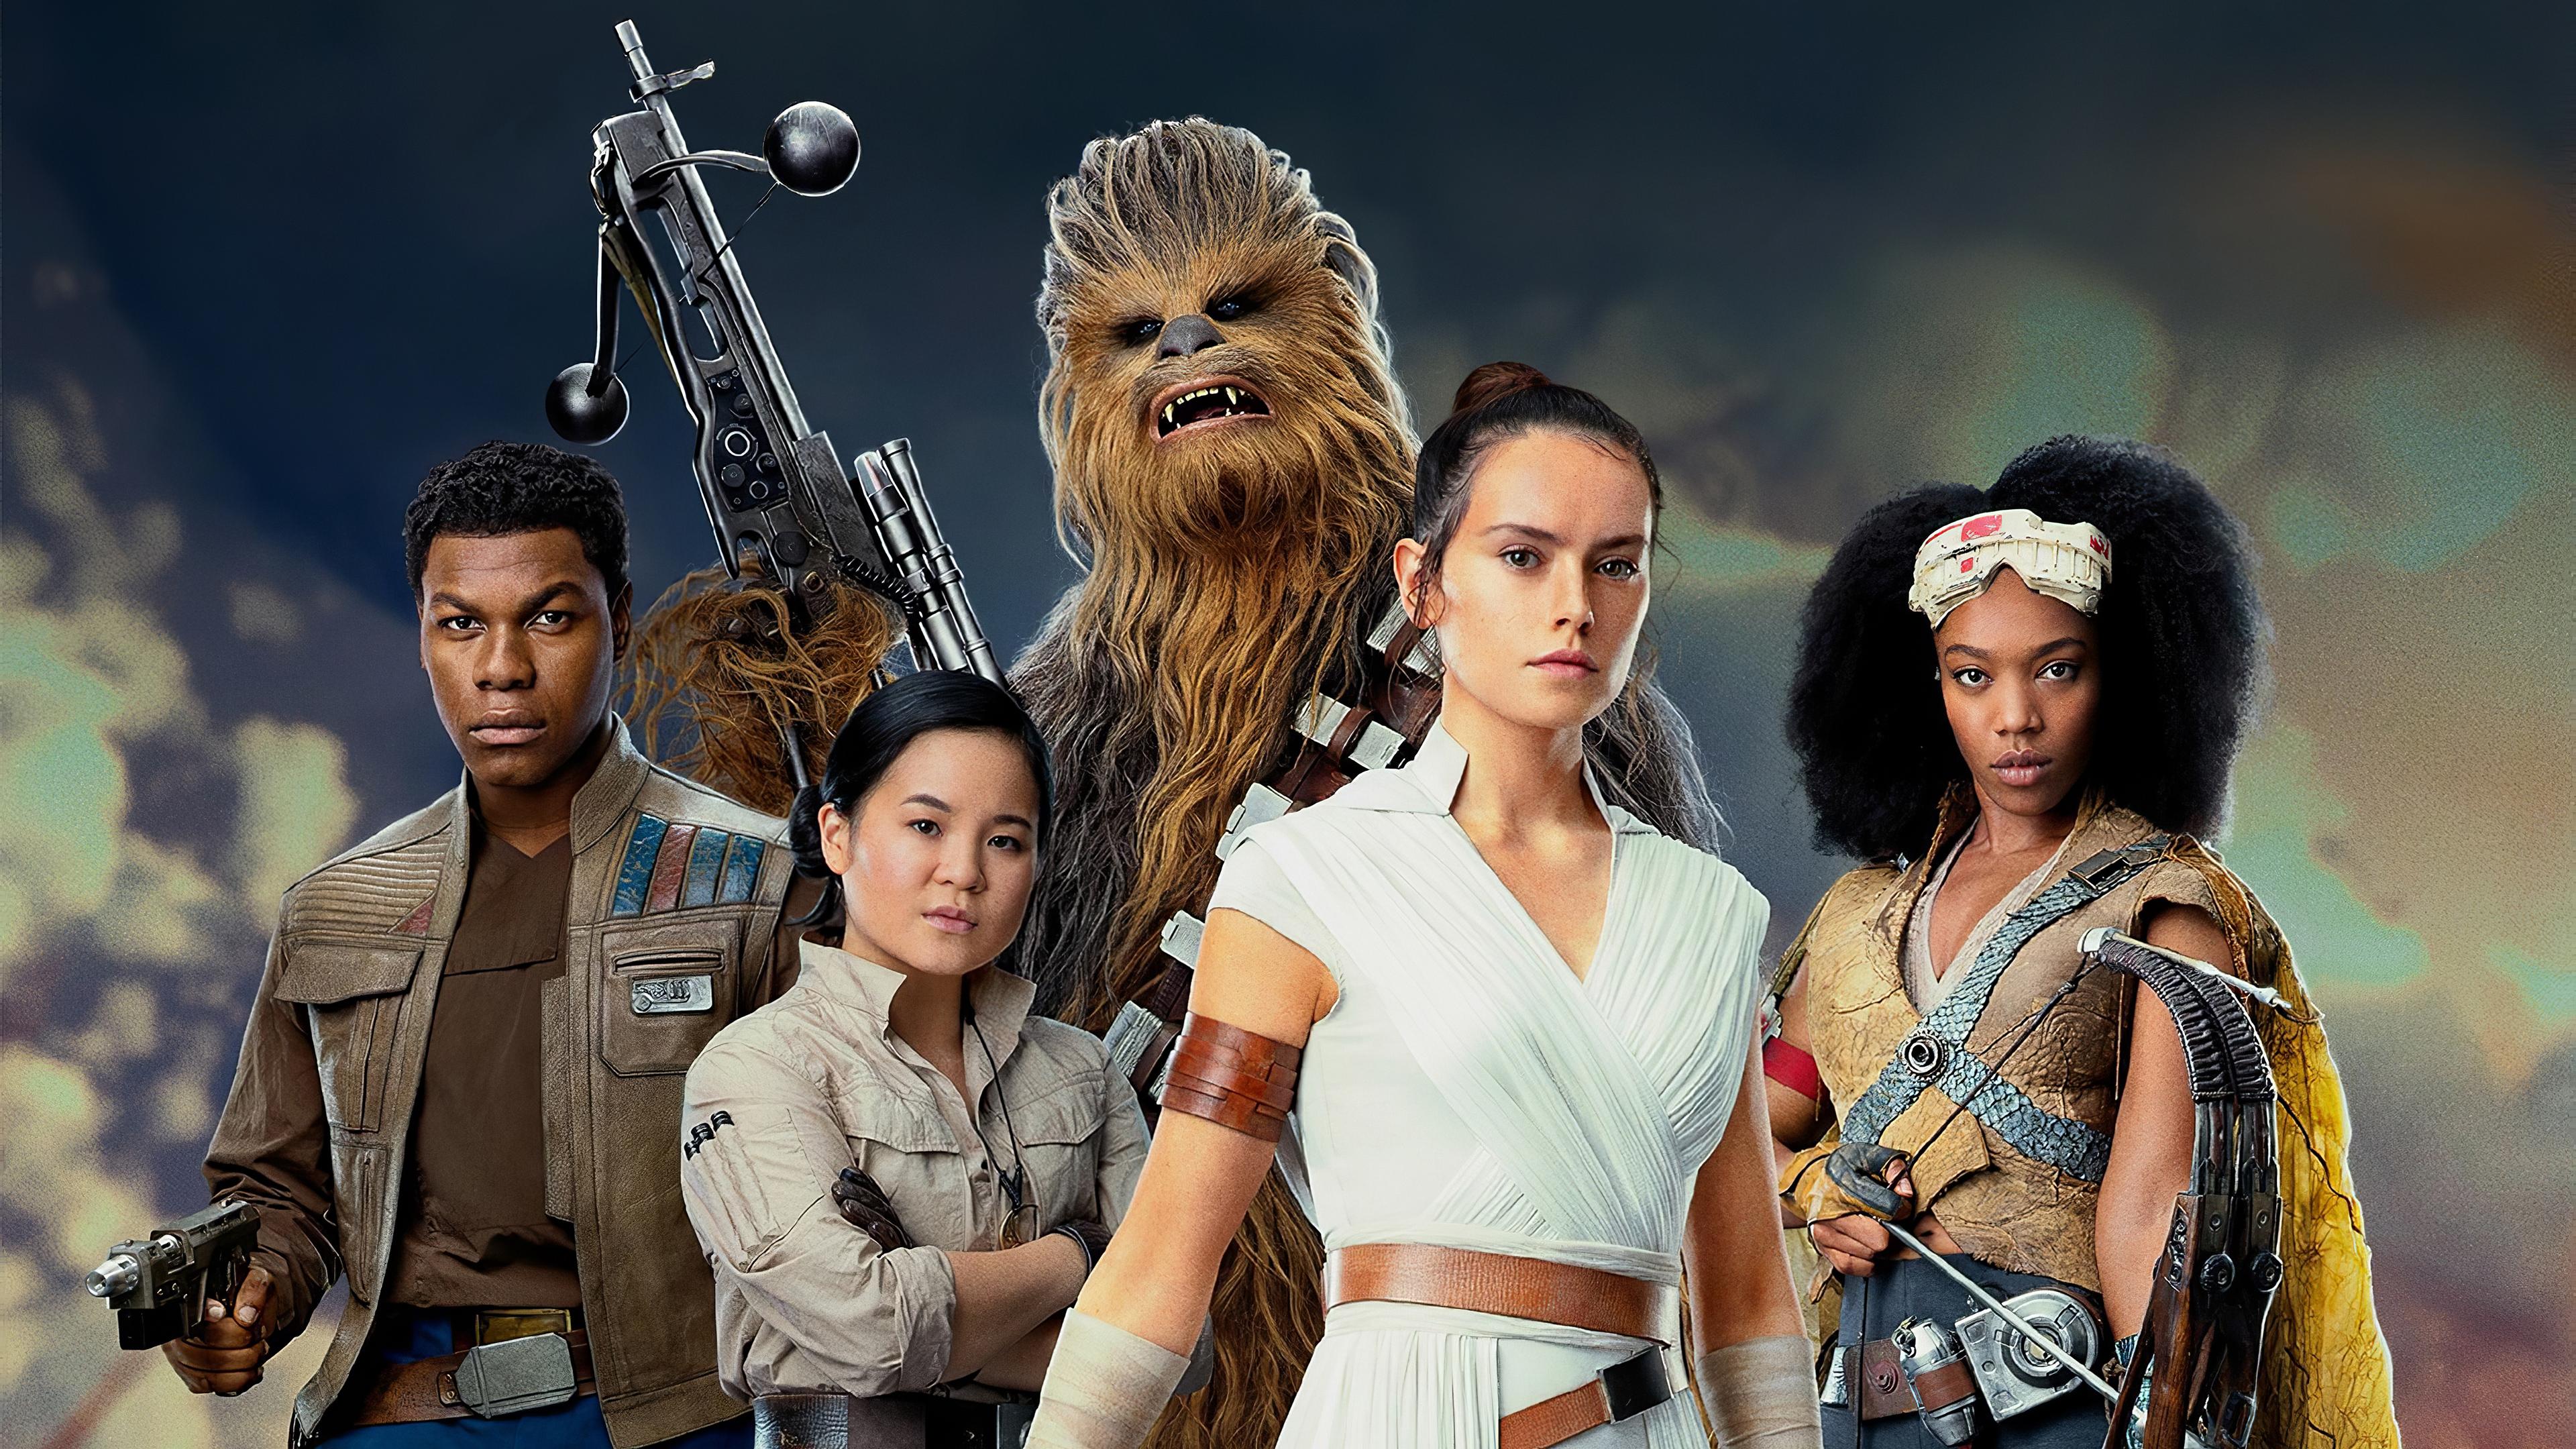 Star Wars The Rise Of Skywalker 4k Ultra Hd Wallpaper Background Image 3840x2160